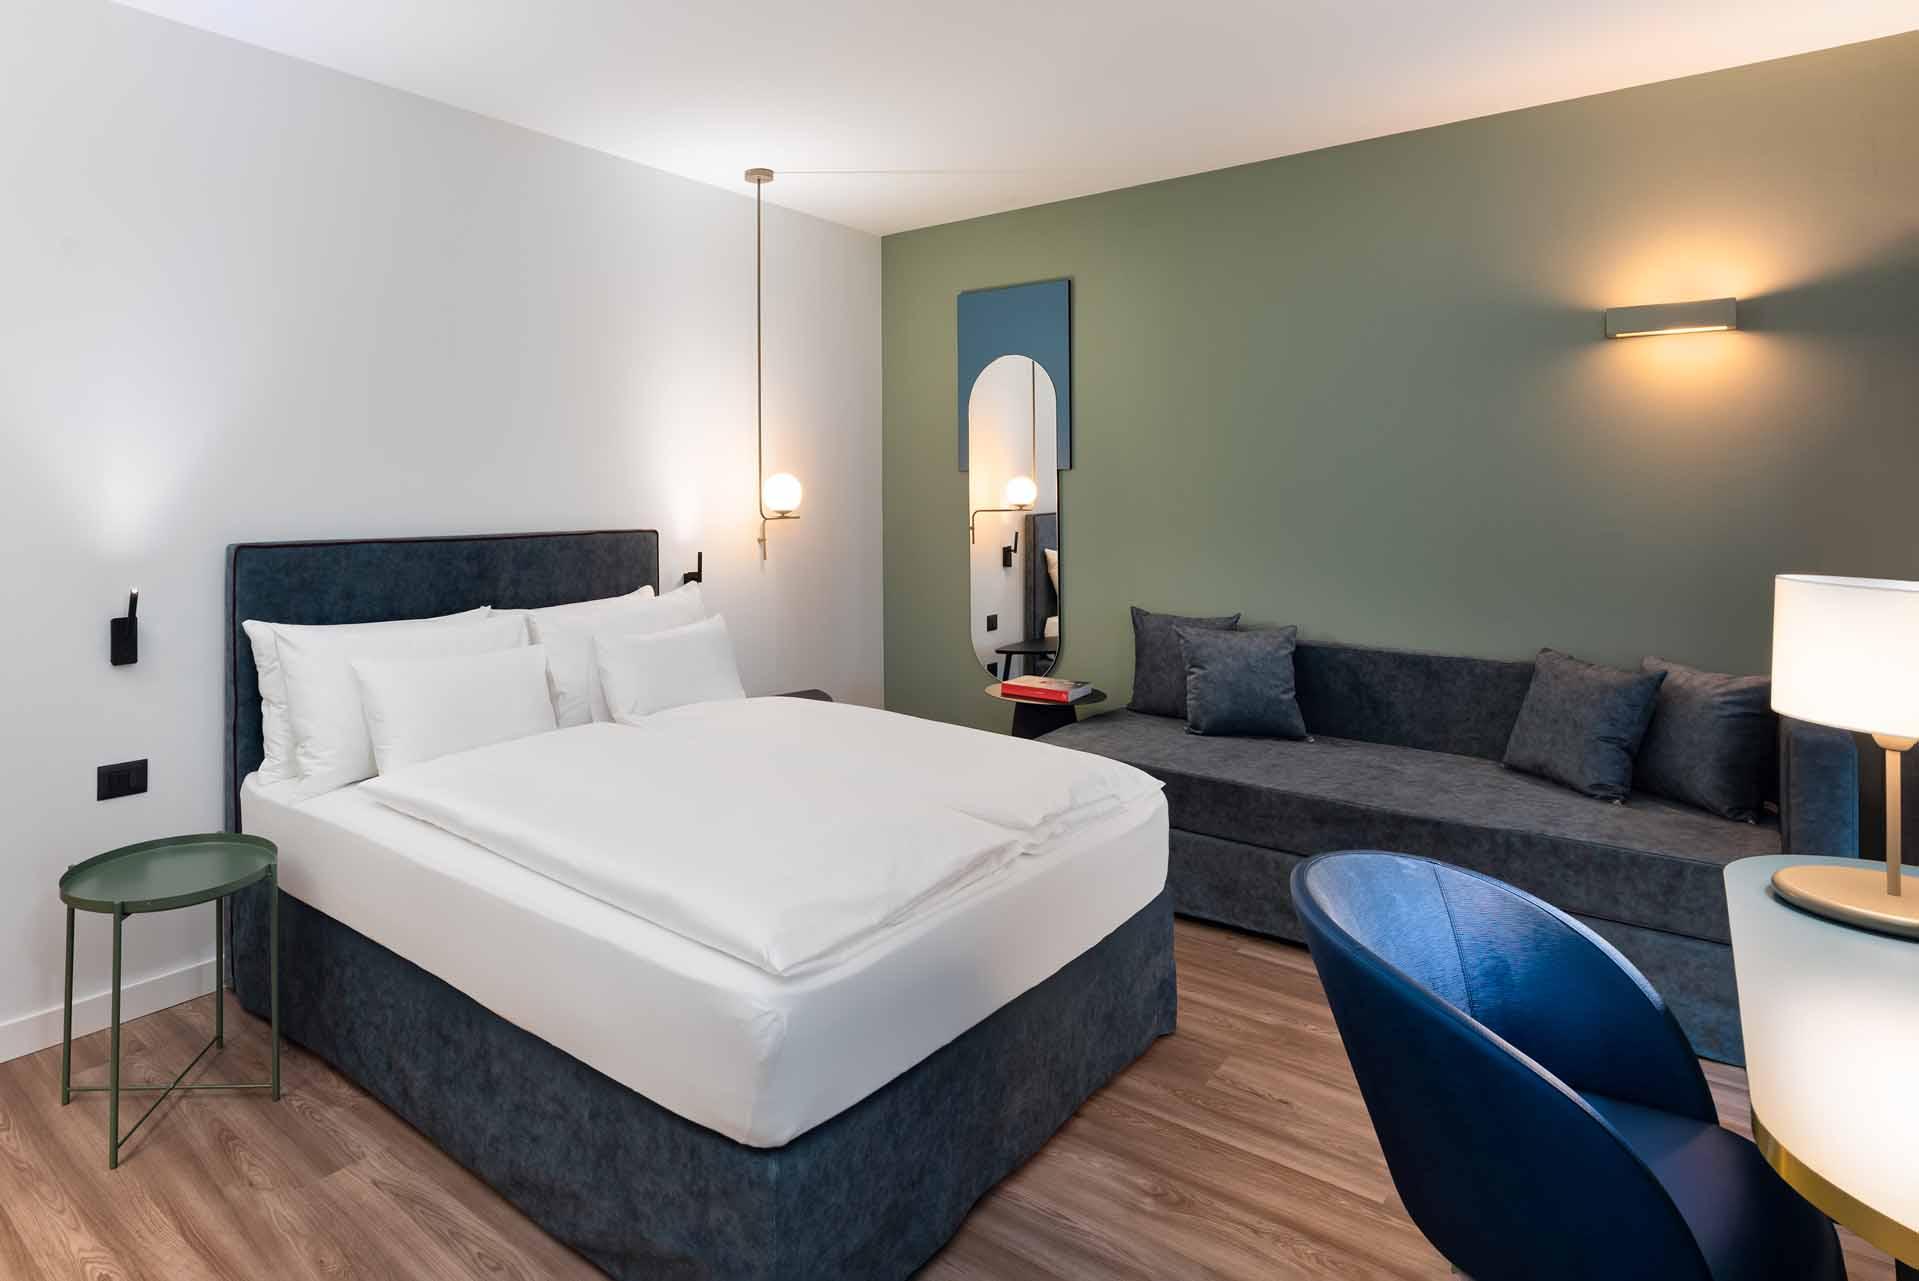 Hotel Trieste Gradisca 022